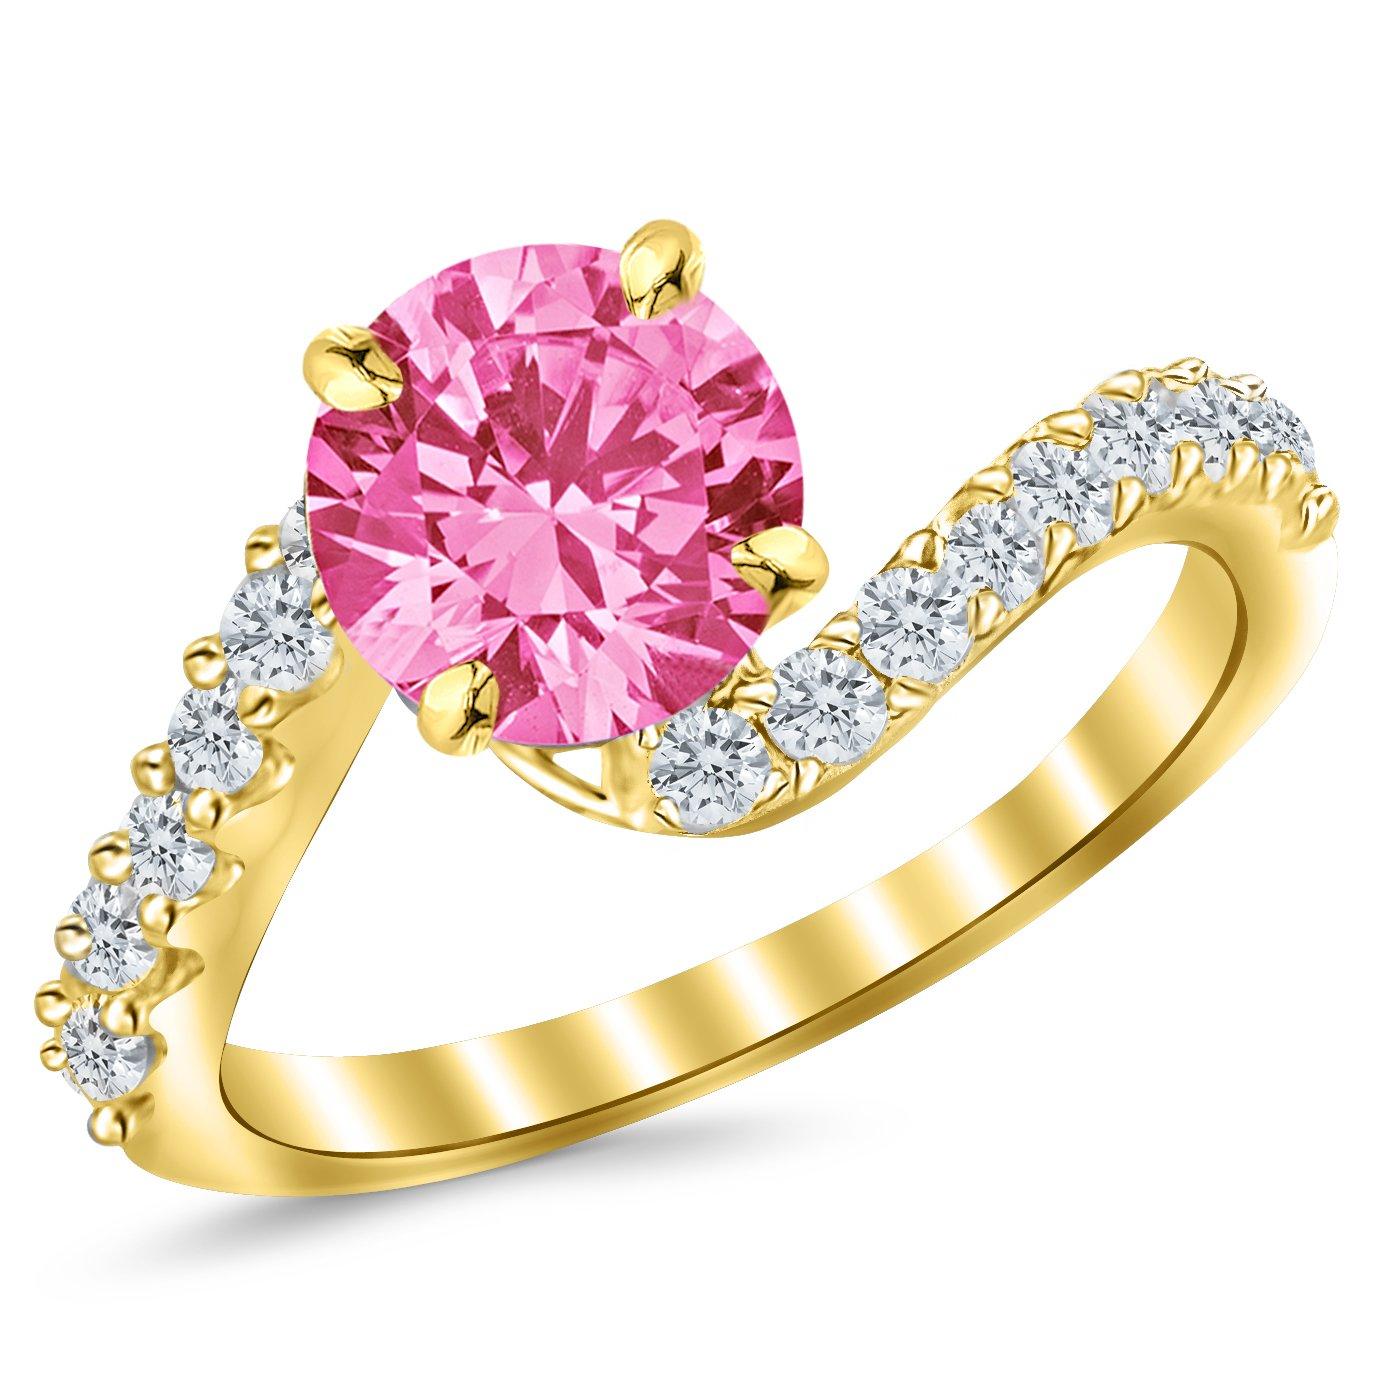 1.26 Carat 14K White Gold Twisting & Curving Diamond Engagement Ring ...